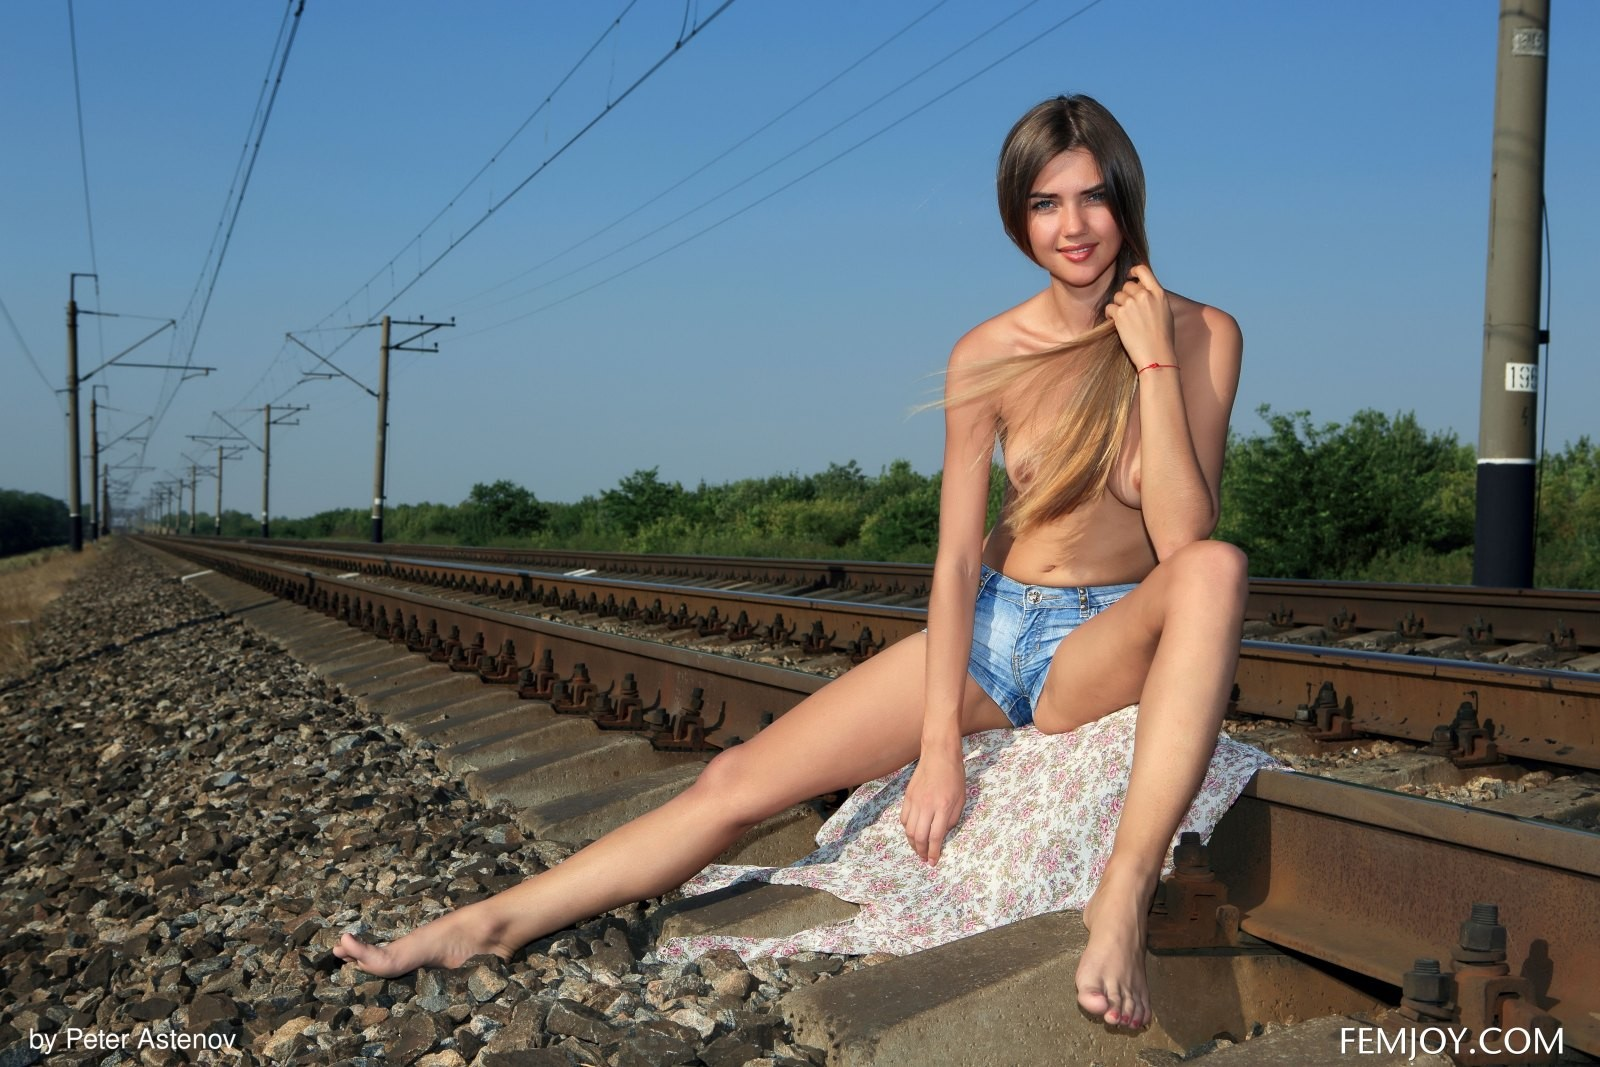 Девка в шортах без лифчика на рельсах - фото